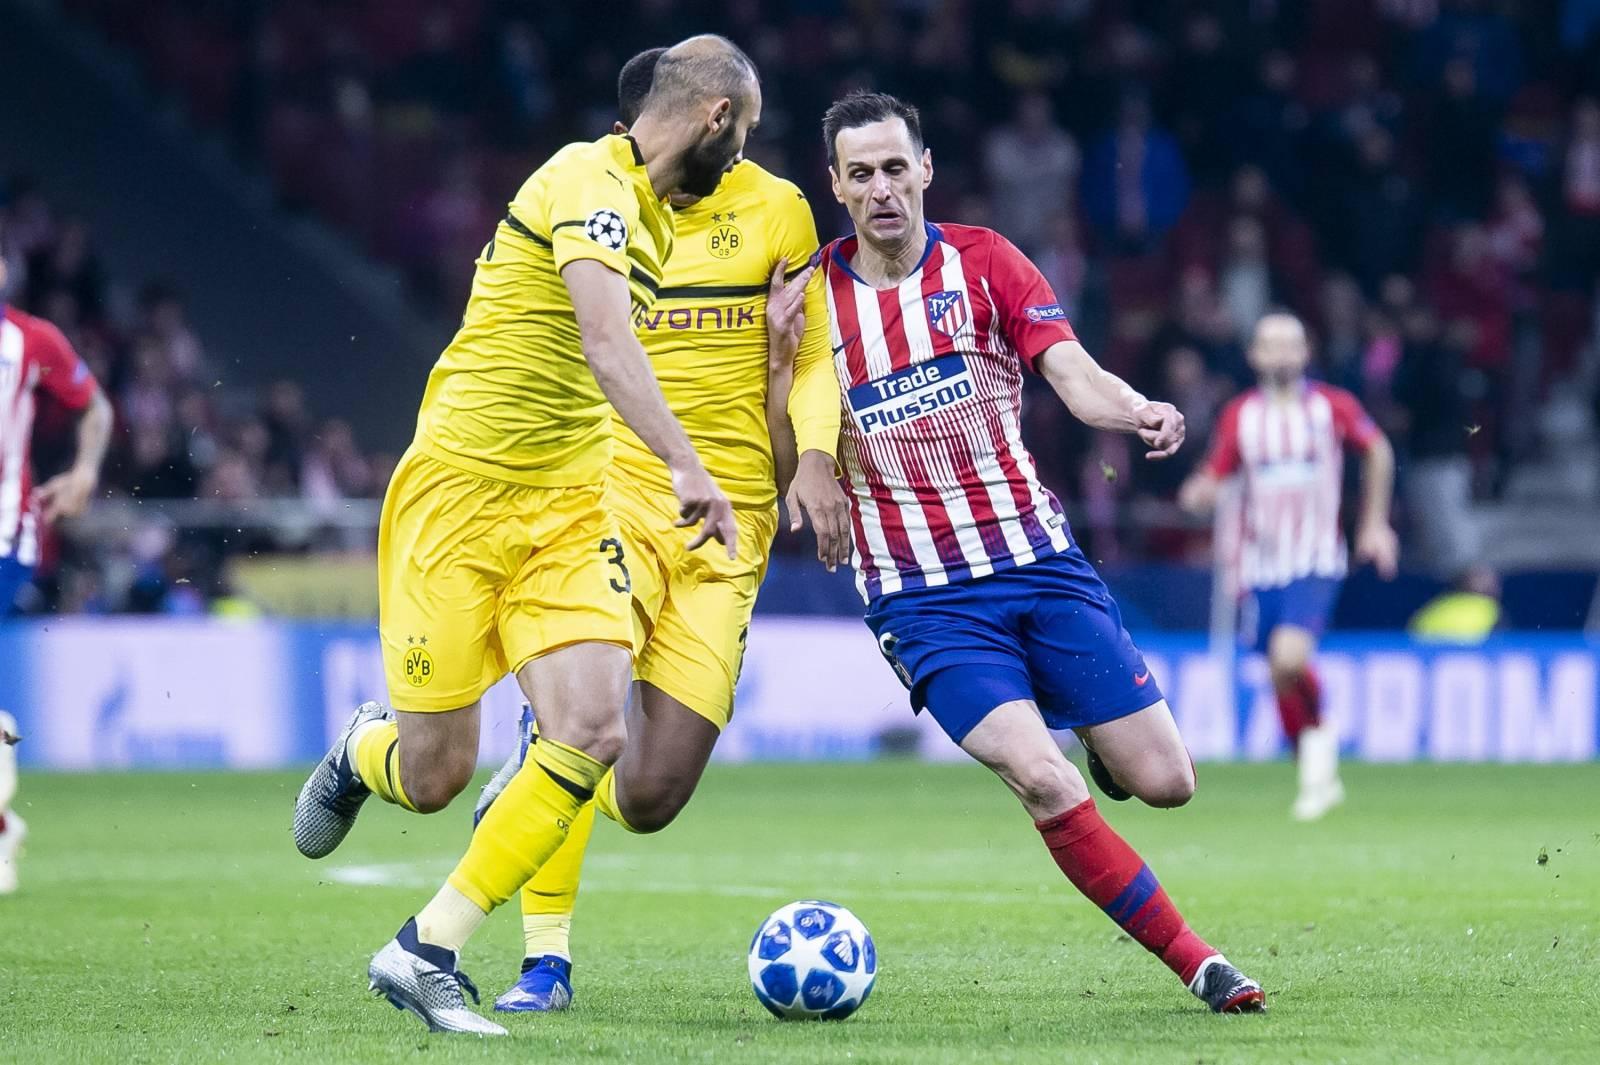 ATLETICO DE MADRID v BORUSSIA DORTMUND. Champions League 2018-2019.